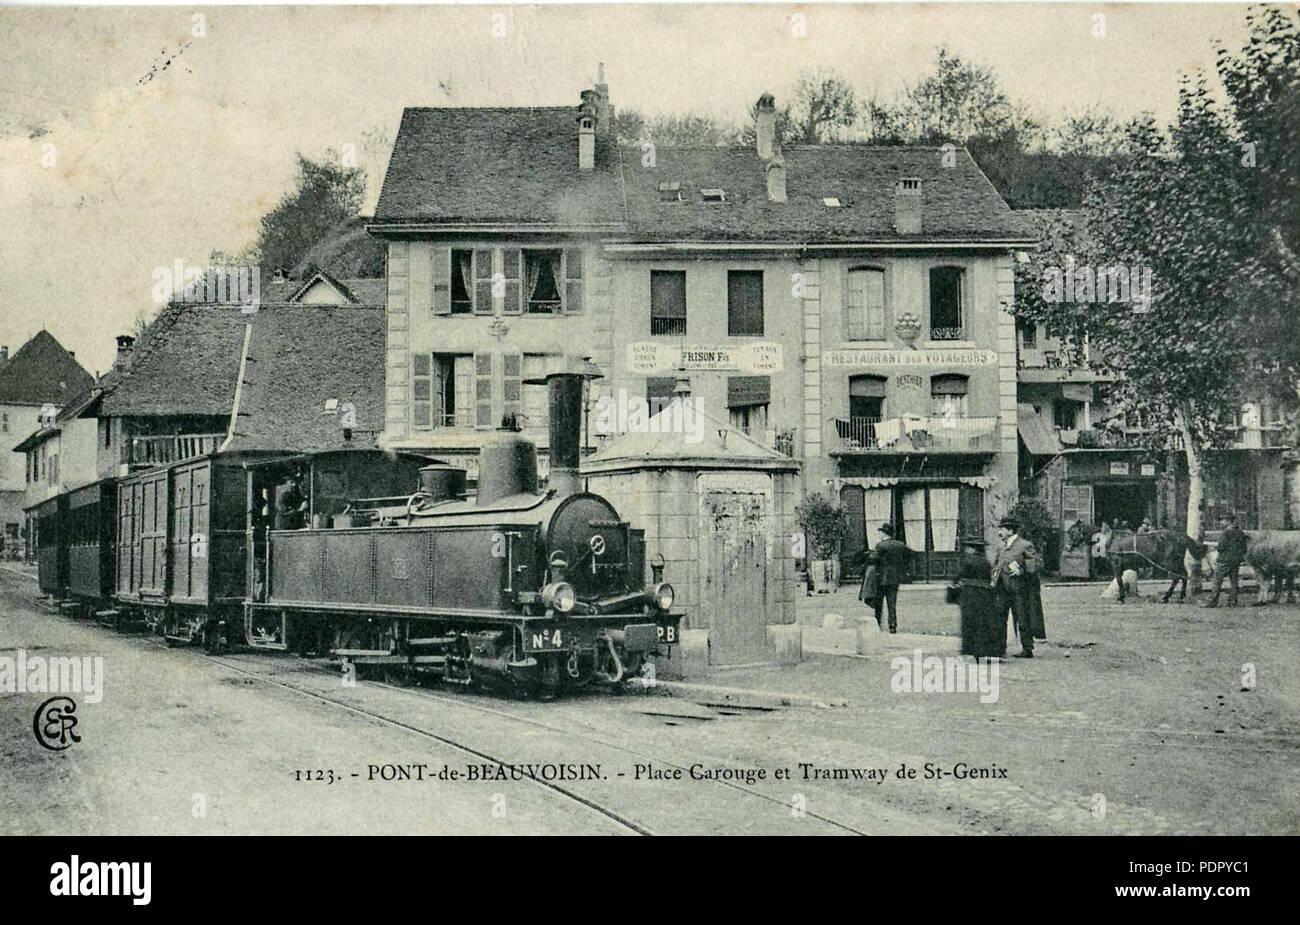 123 ER 1123 - Pont-de-Beauvoisin - Lugar de St-Genix Carouge et tranvía Foto de stock